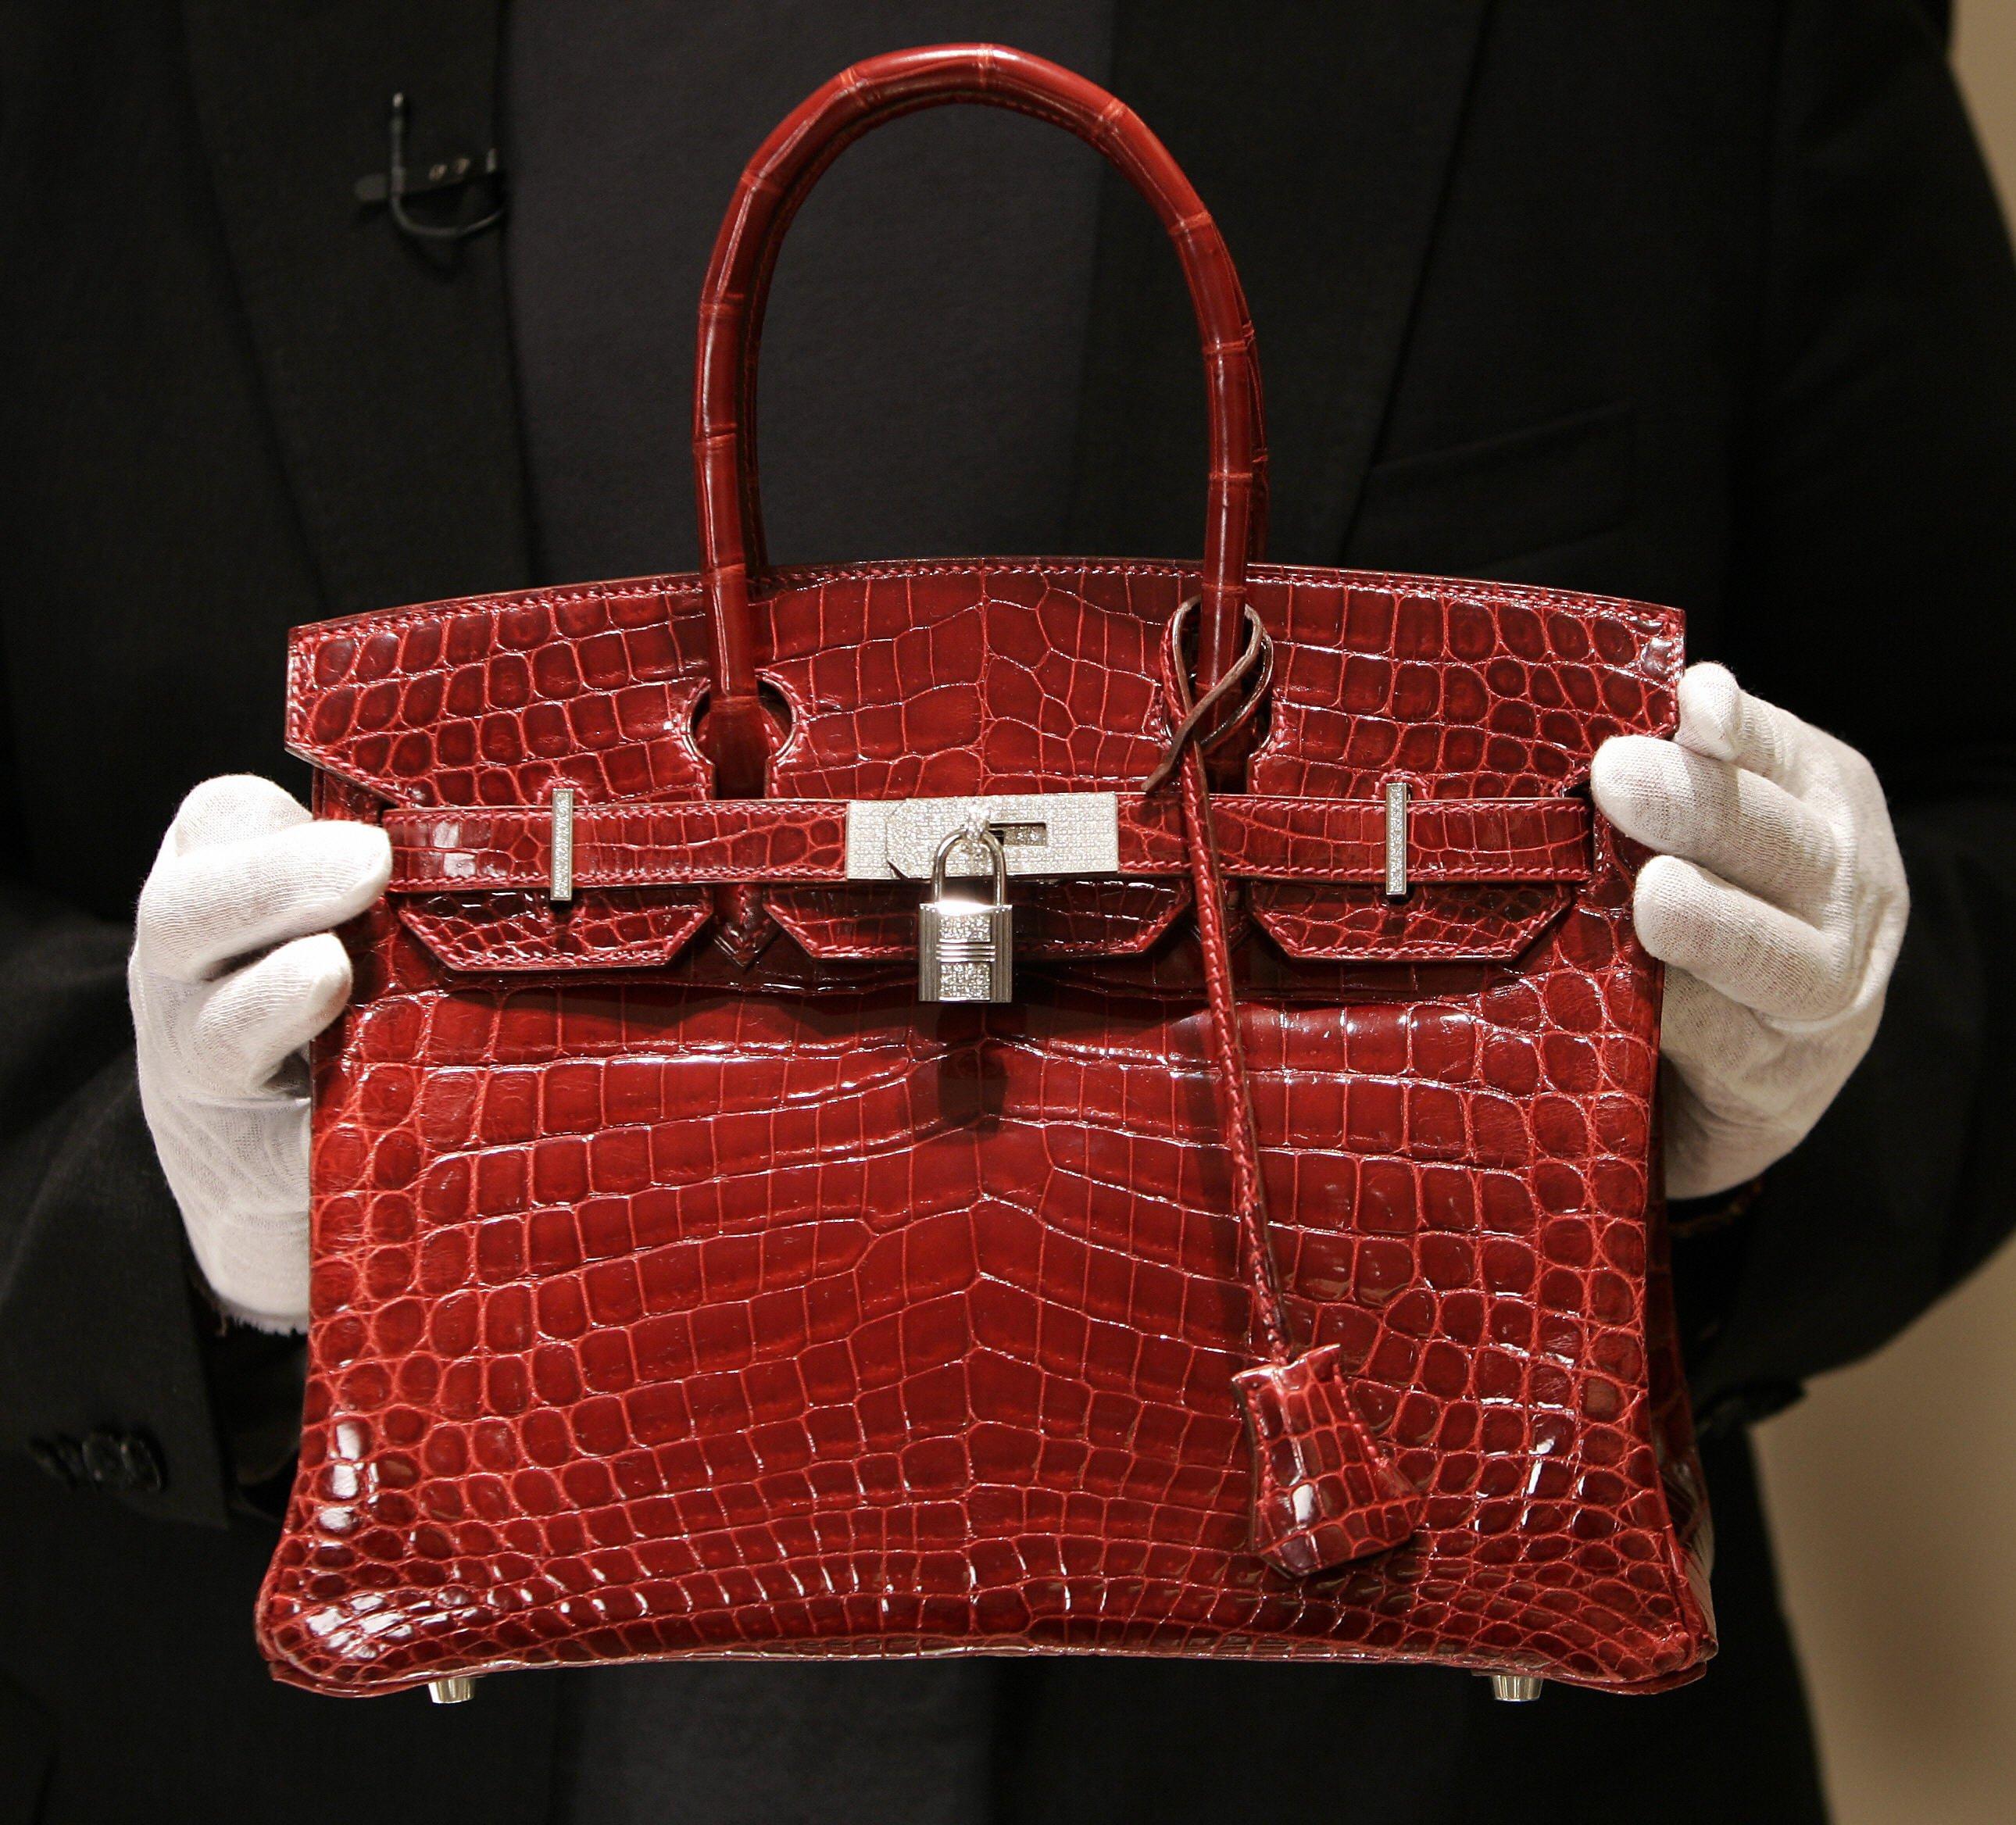 97602e7cba73 low price new york united states a employee holds a 129000 usd crocodile  hermes birkin bag